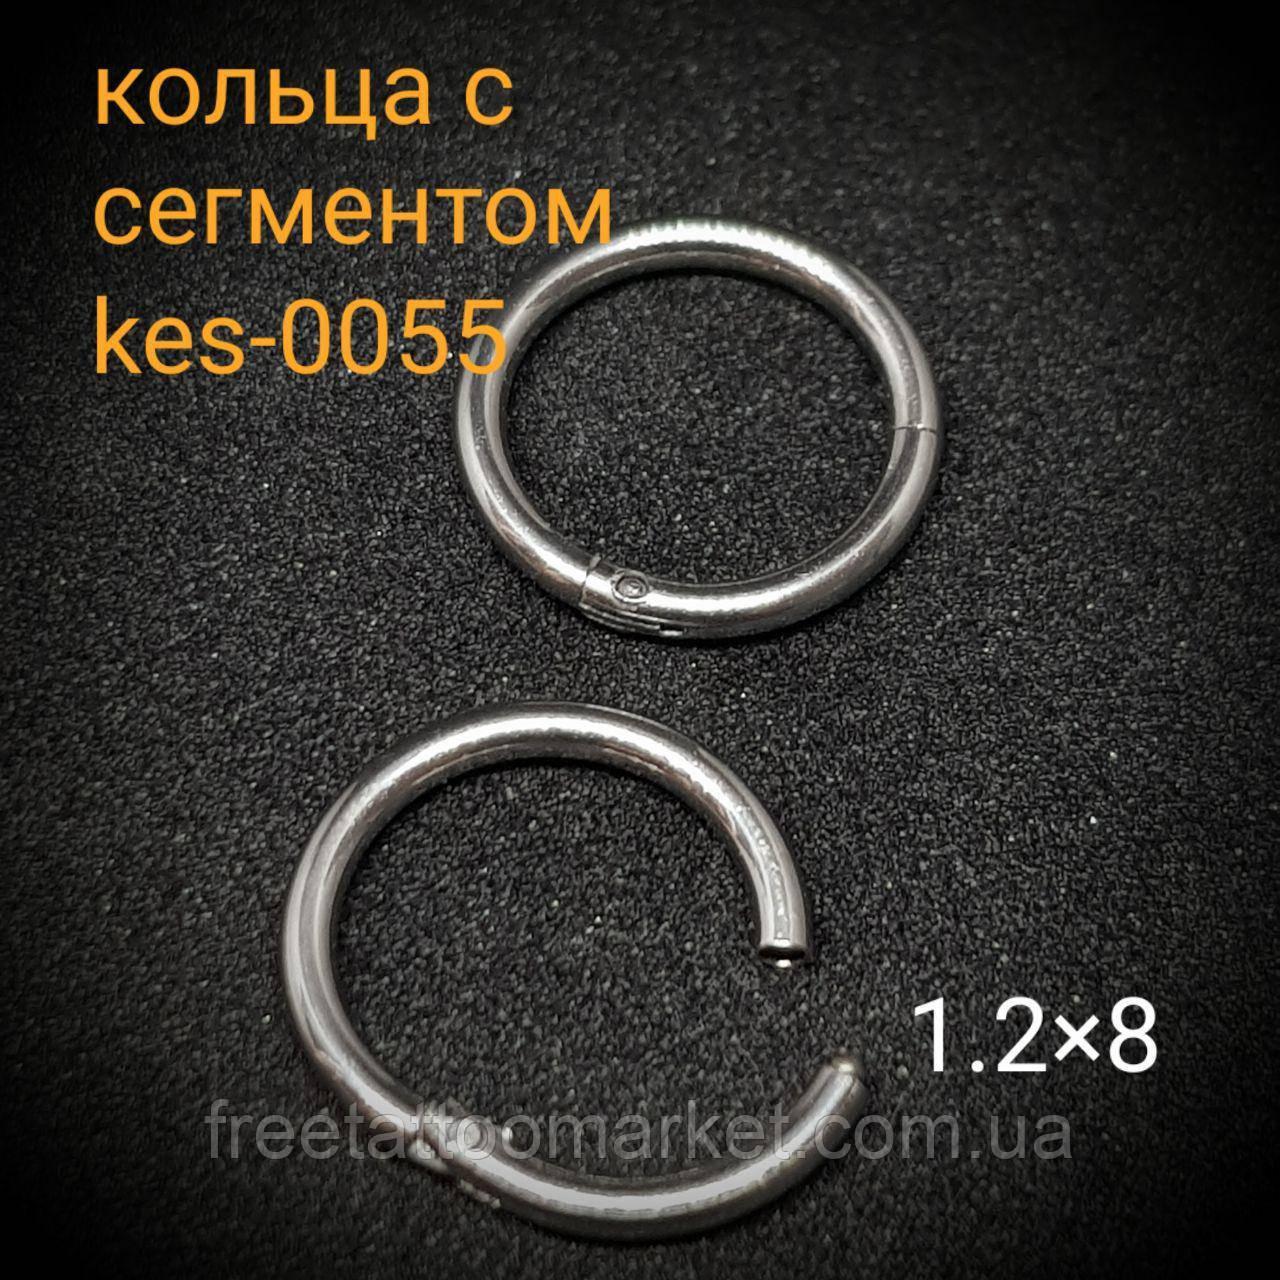 Кольцо сегментно-кликерное (серебро) 1.2 х 8мм